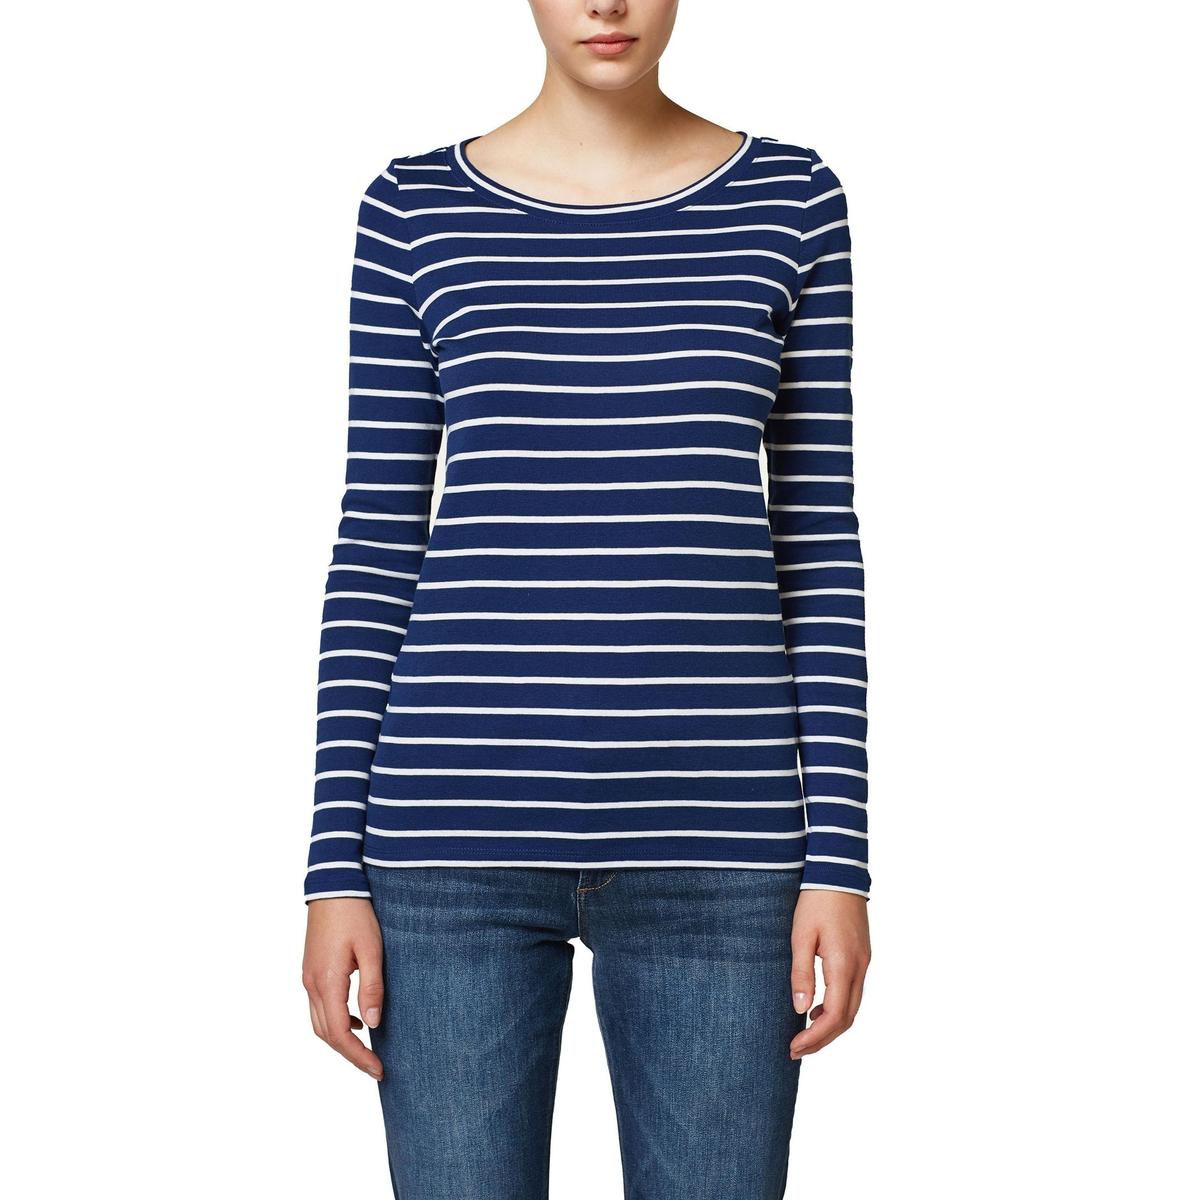 Camiseta con cuello redondo a rayas, manga larga